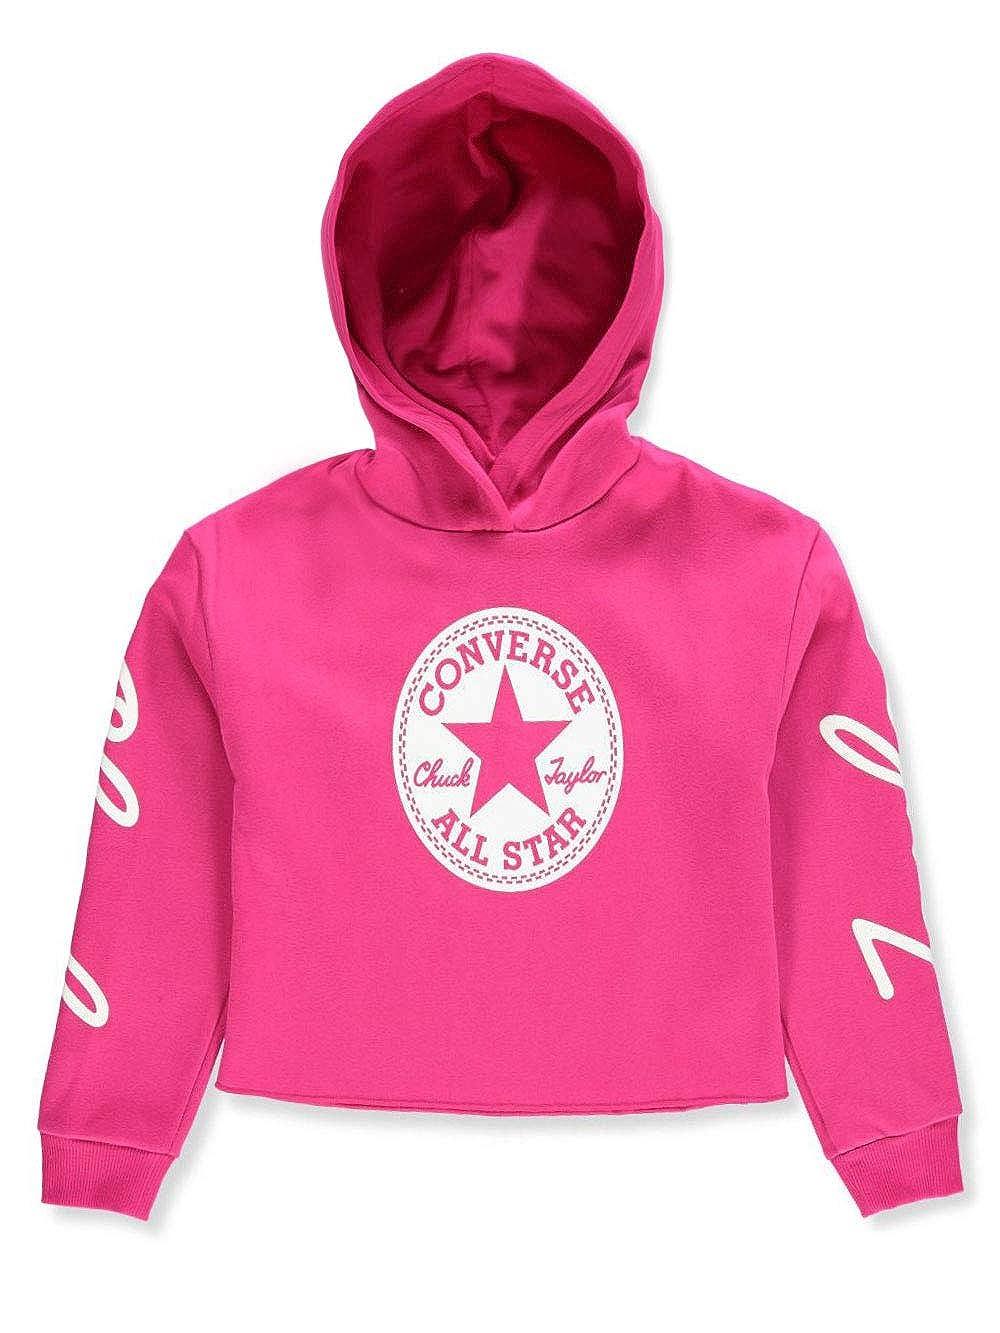 9271d75dda09 Amazon.com  Converse Kids Girl s Chuck Taylor Signature Pullover Hoodie (Big  Kids) Pink Pop Medium  Clothing